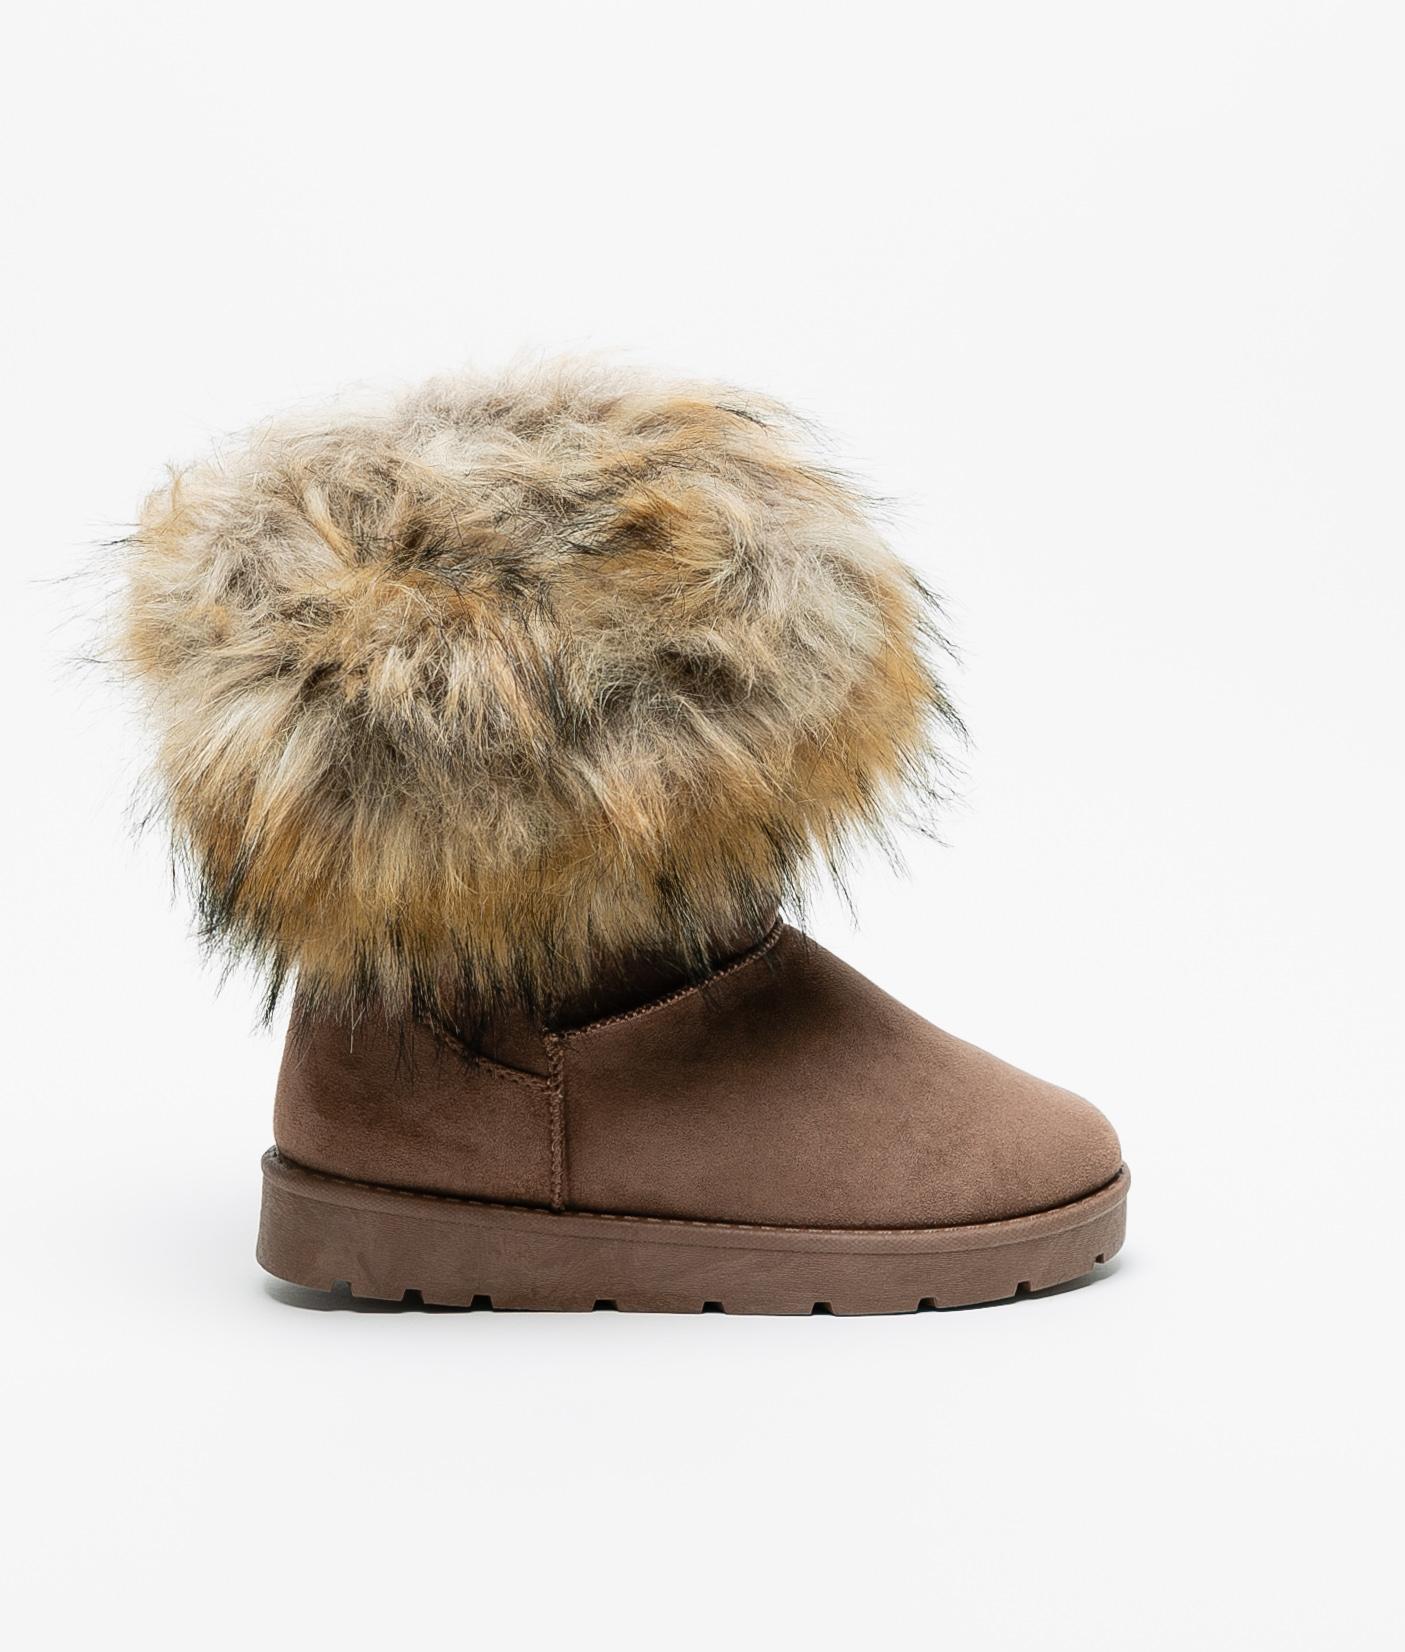 Low Boot Filomena - Beige